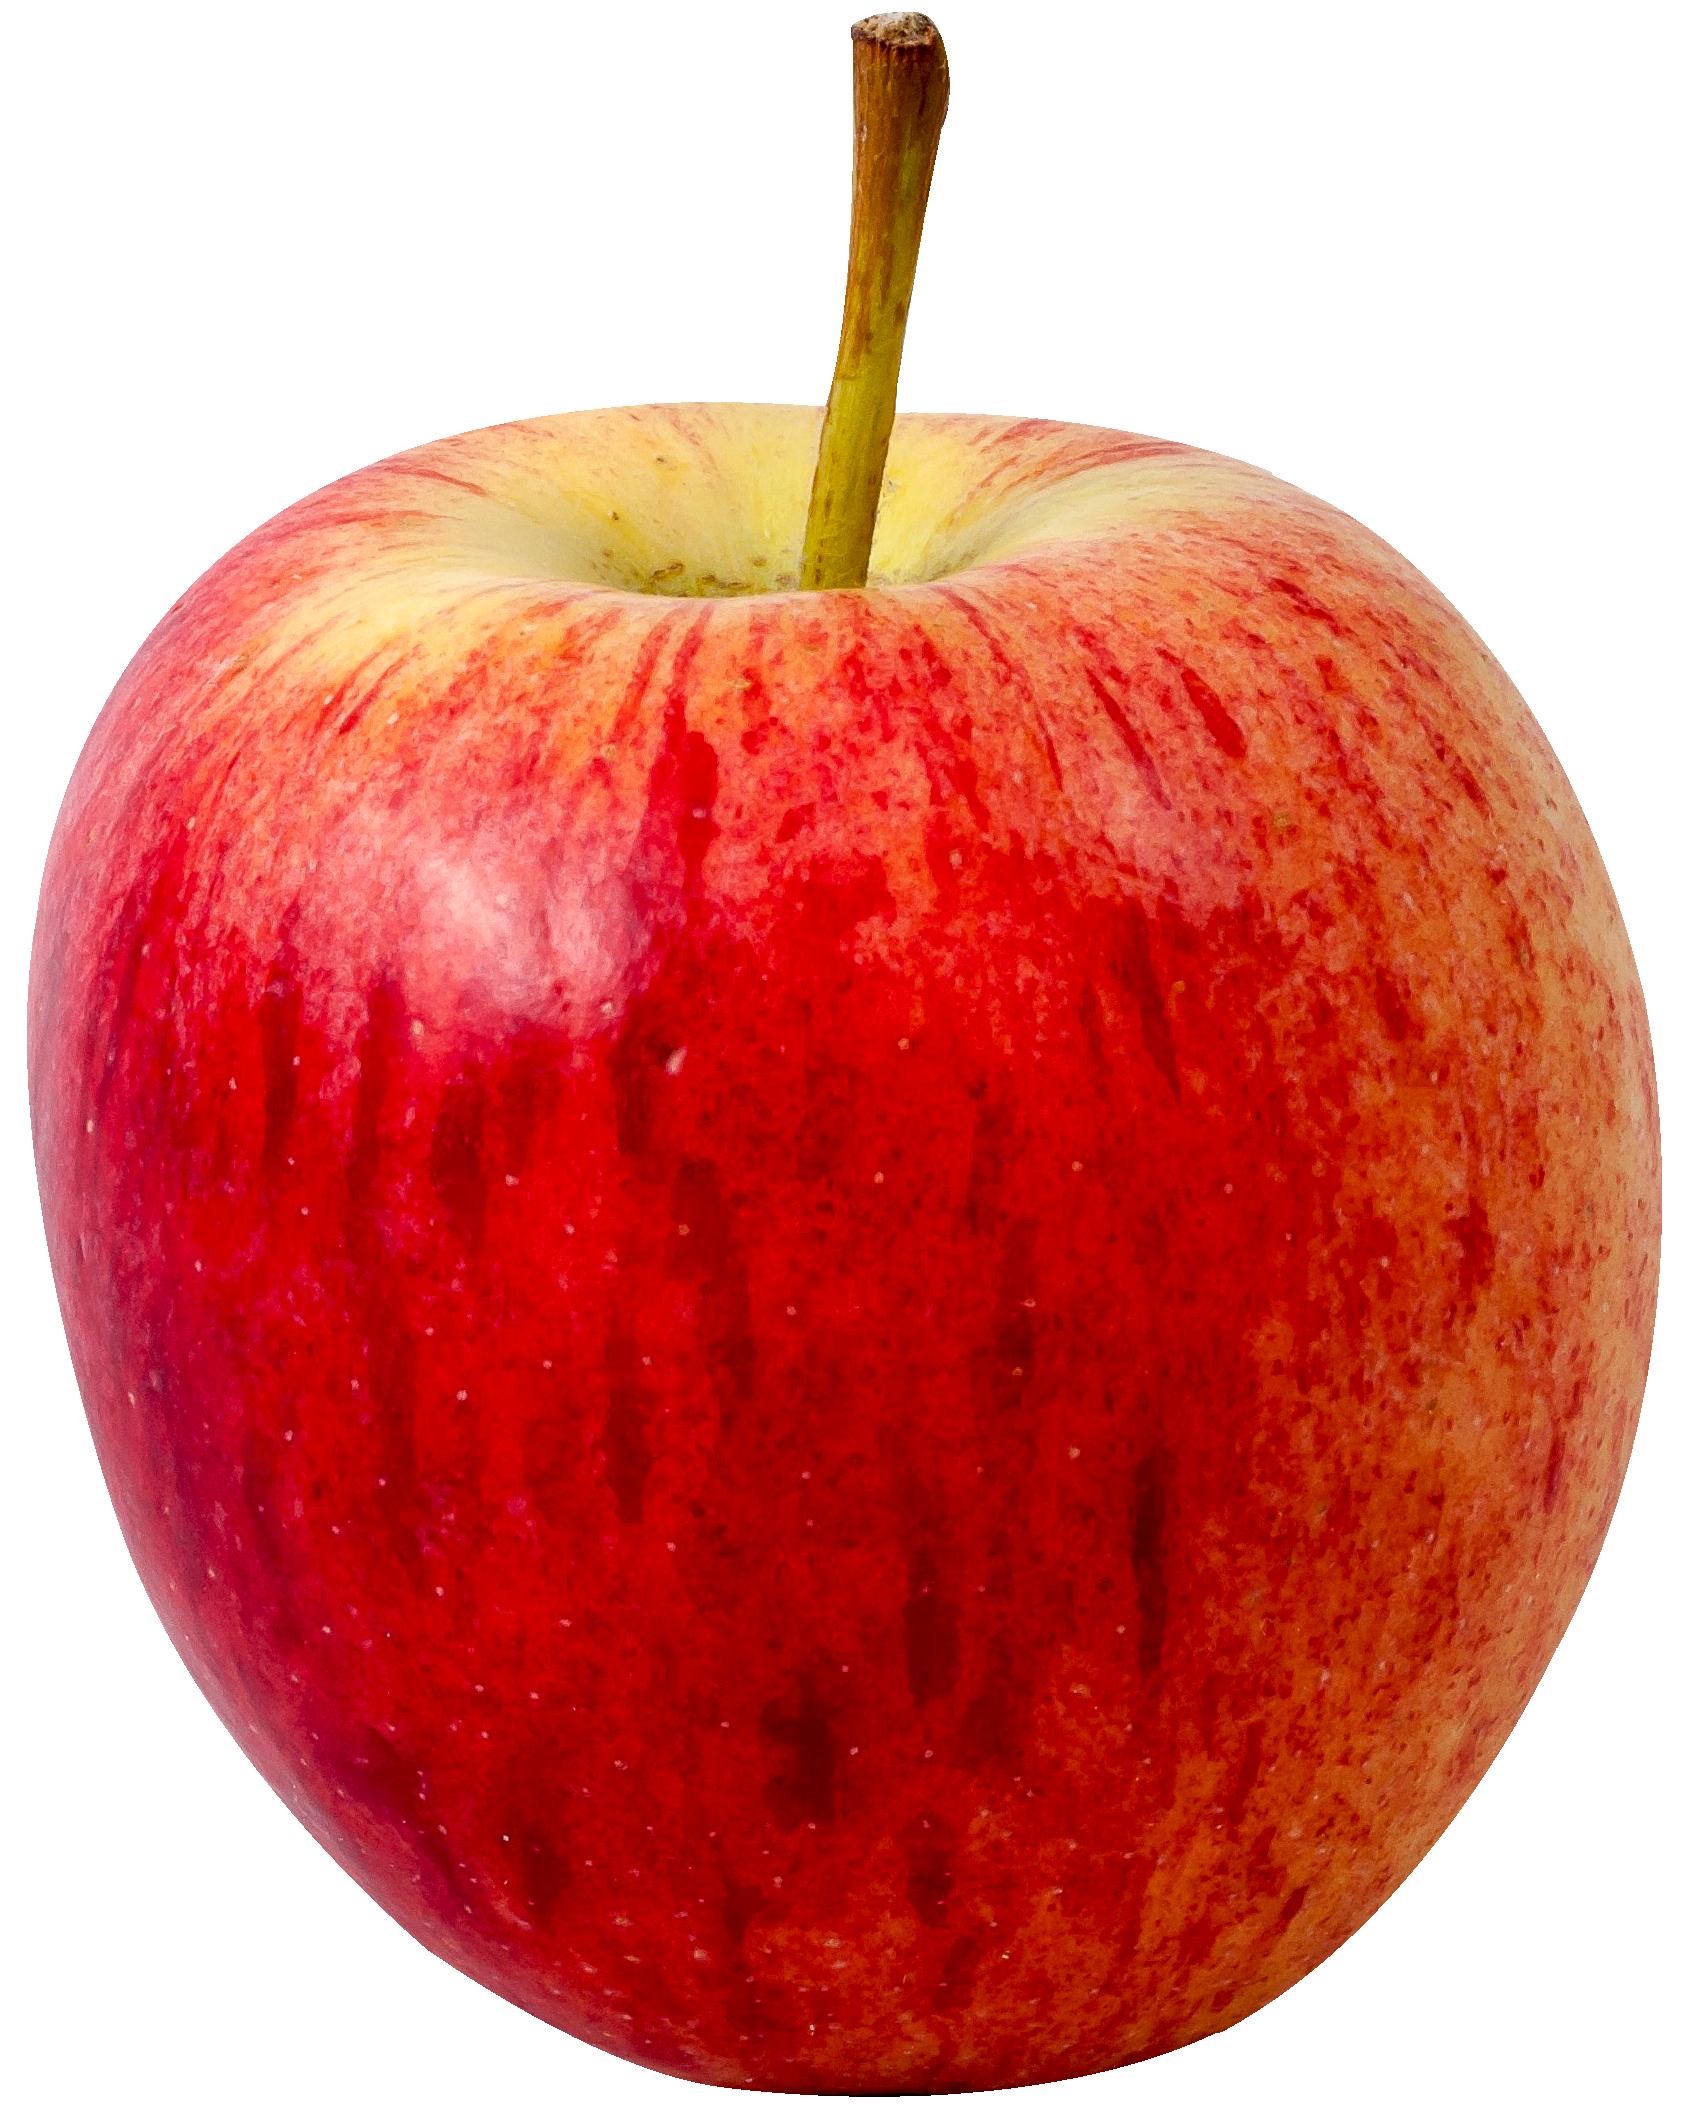 Ripe Apple PNG Image Fruits images, Apple, Fruit